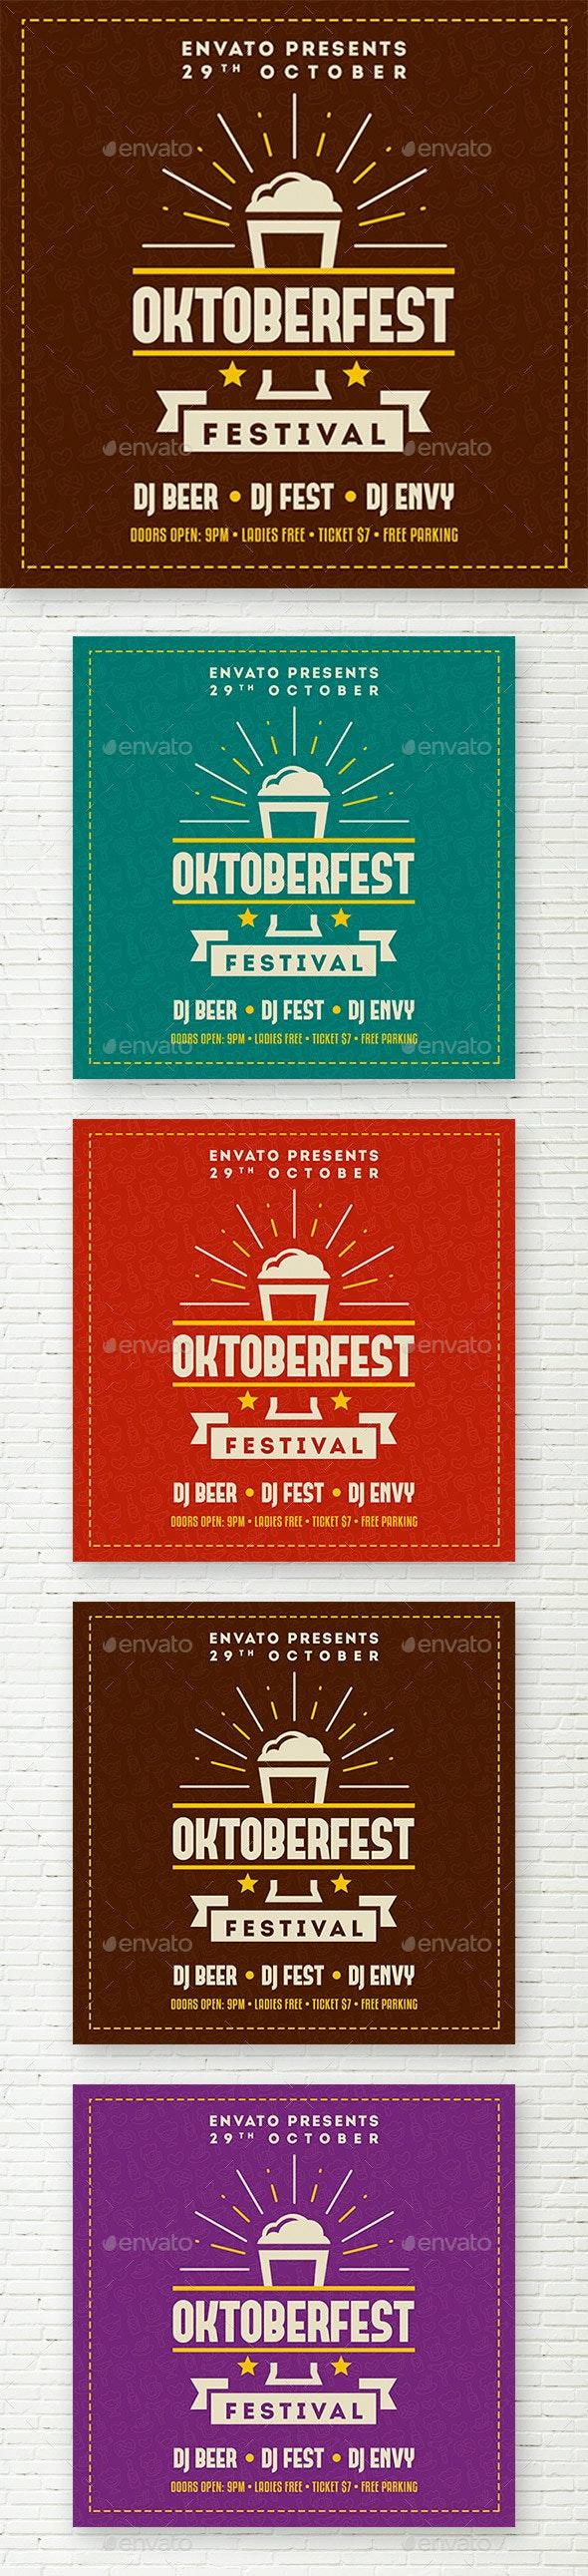 Oktoberfest Instagram Banner - Social Media Web Elements